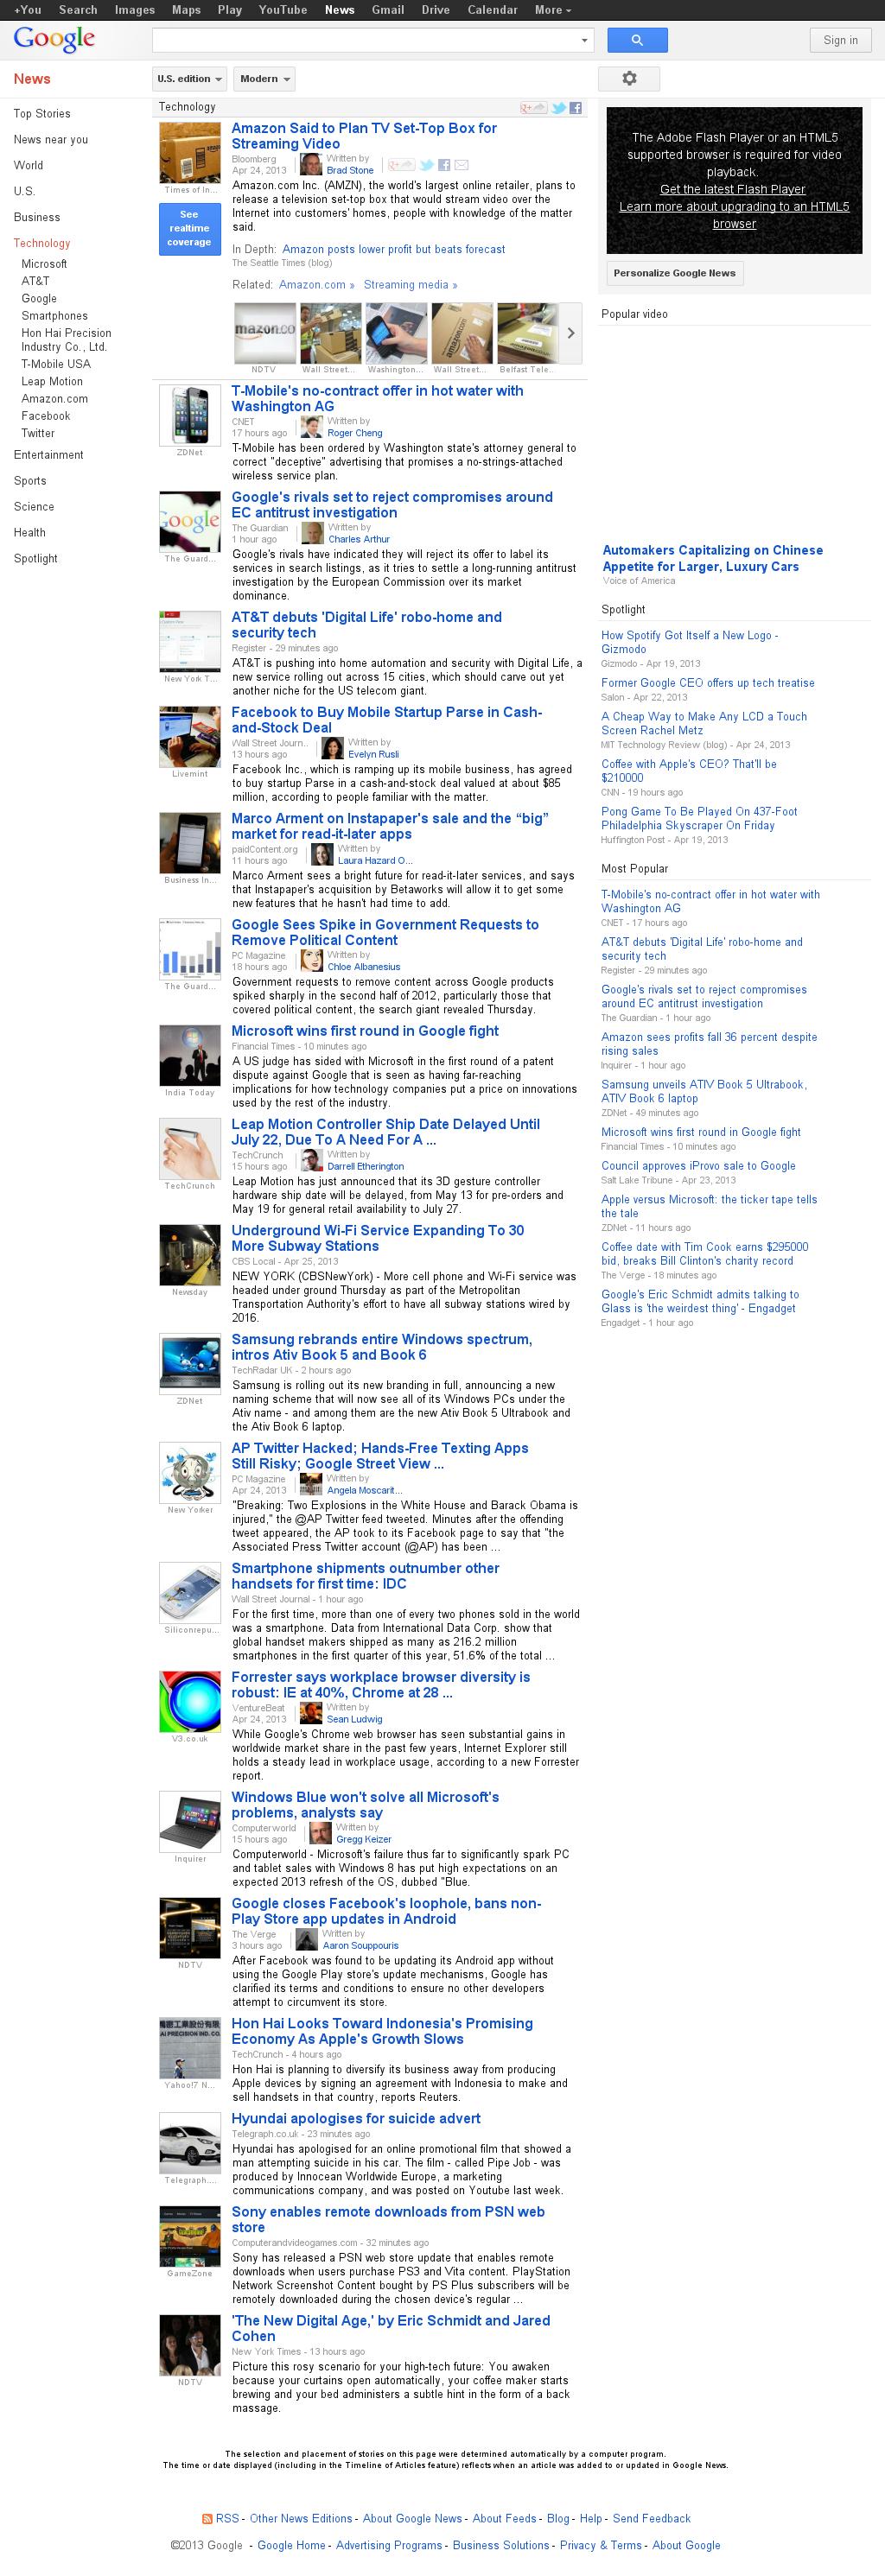 Google News: Technology at Friday April 26, 2013, 12:08 p.m. UTC